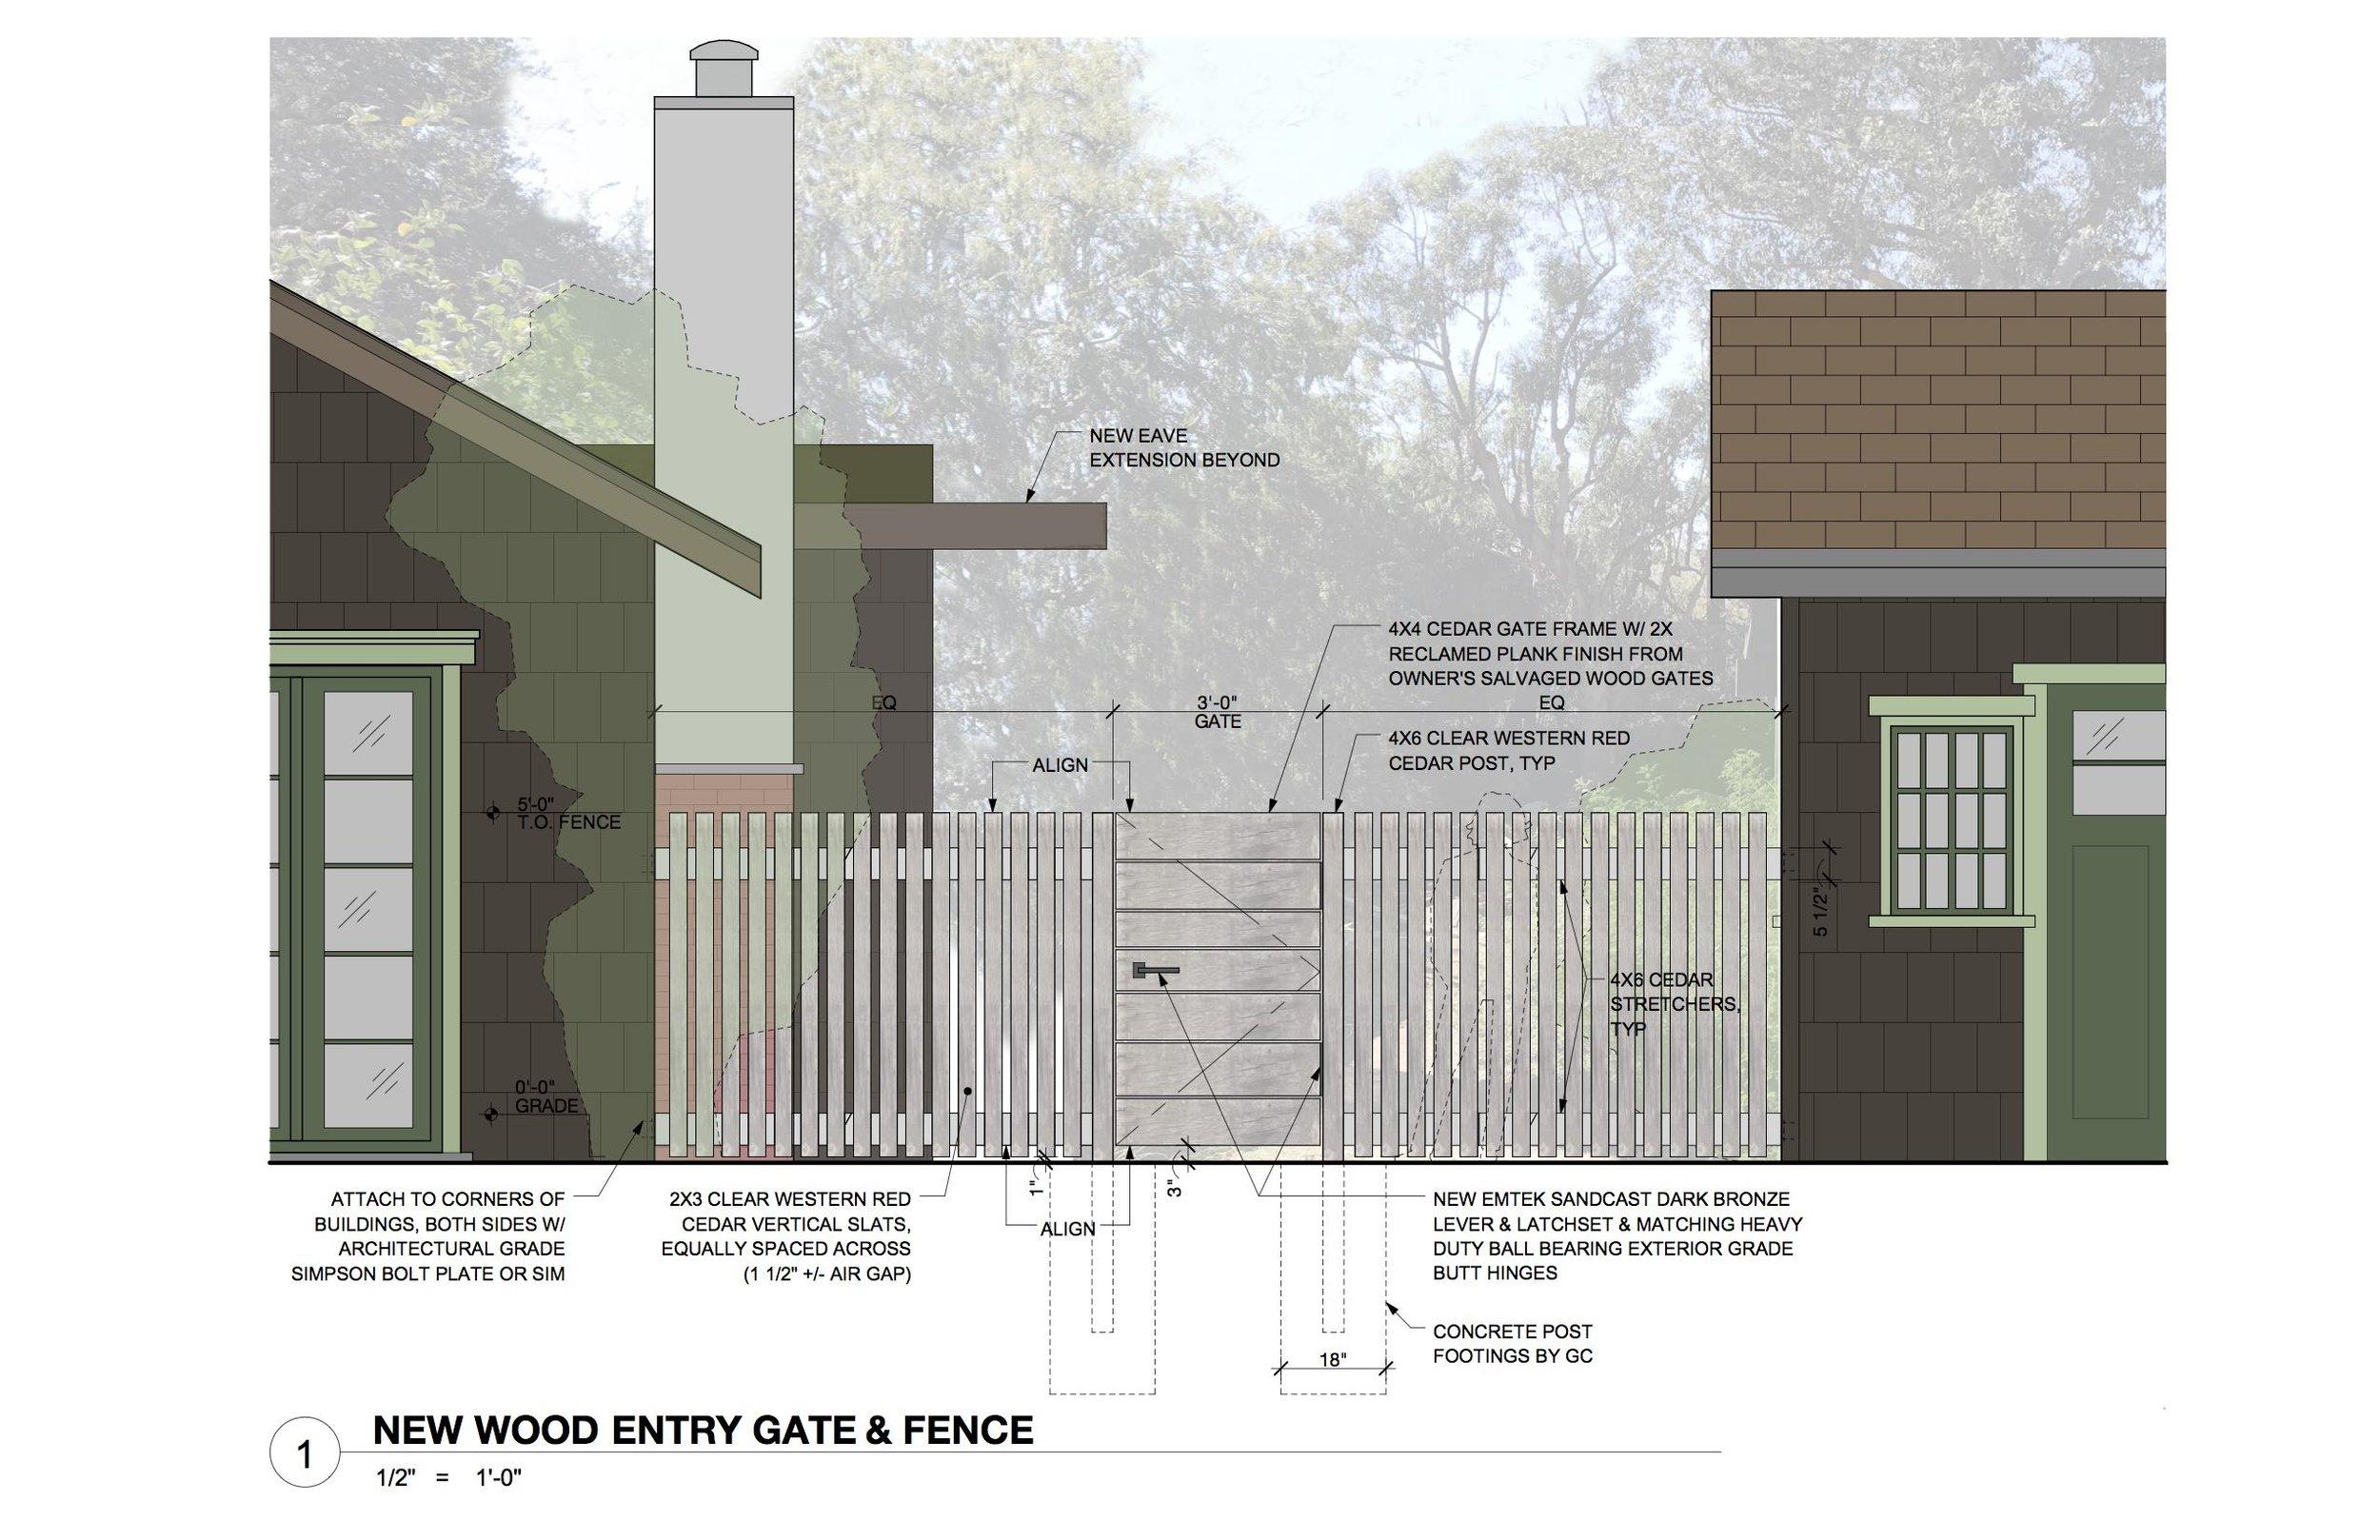 170929 New wood entry gate & fence.jpg